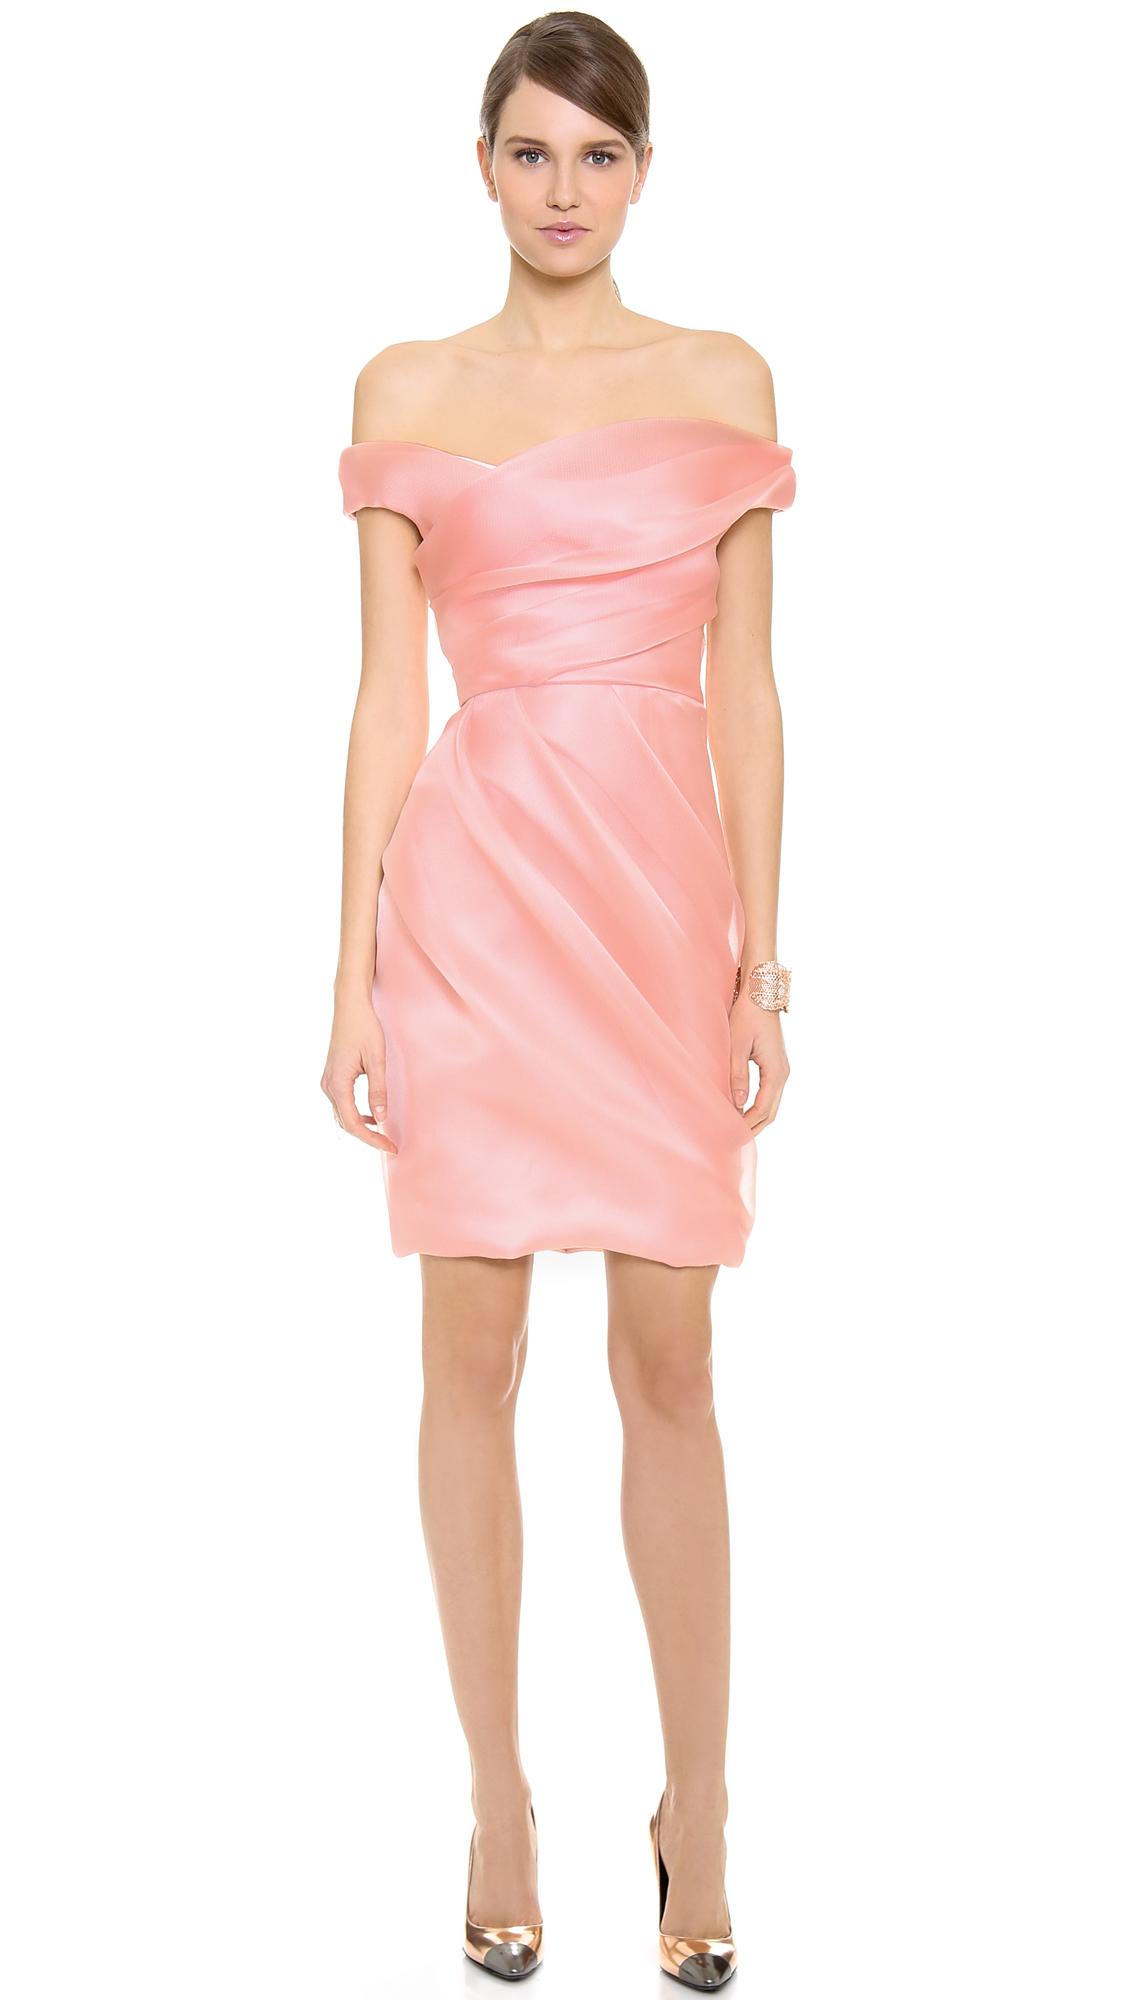 b9f2e806df47 Lyst - Lela Rose Off Shoulder Draped Dress in Pink